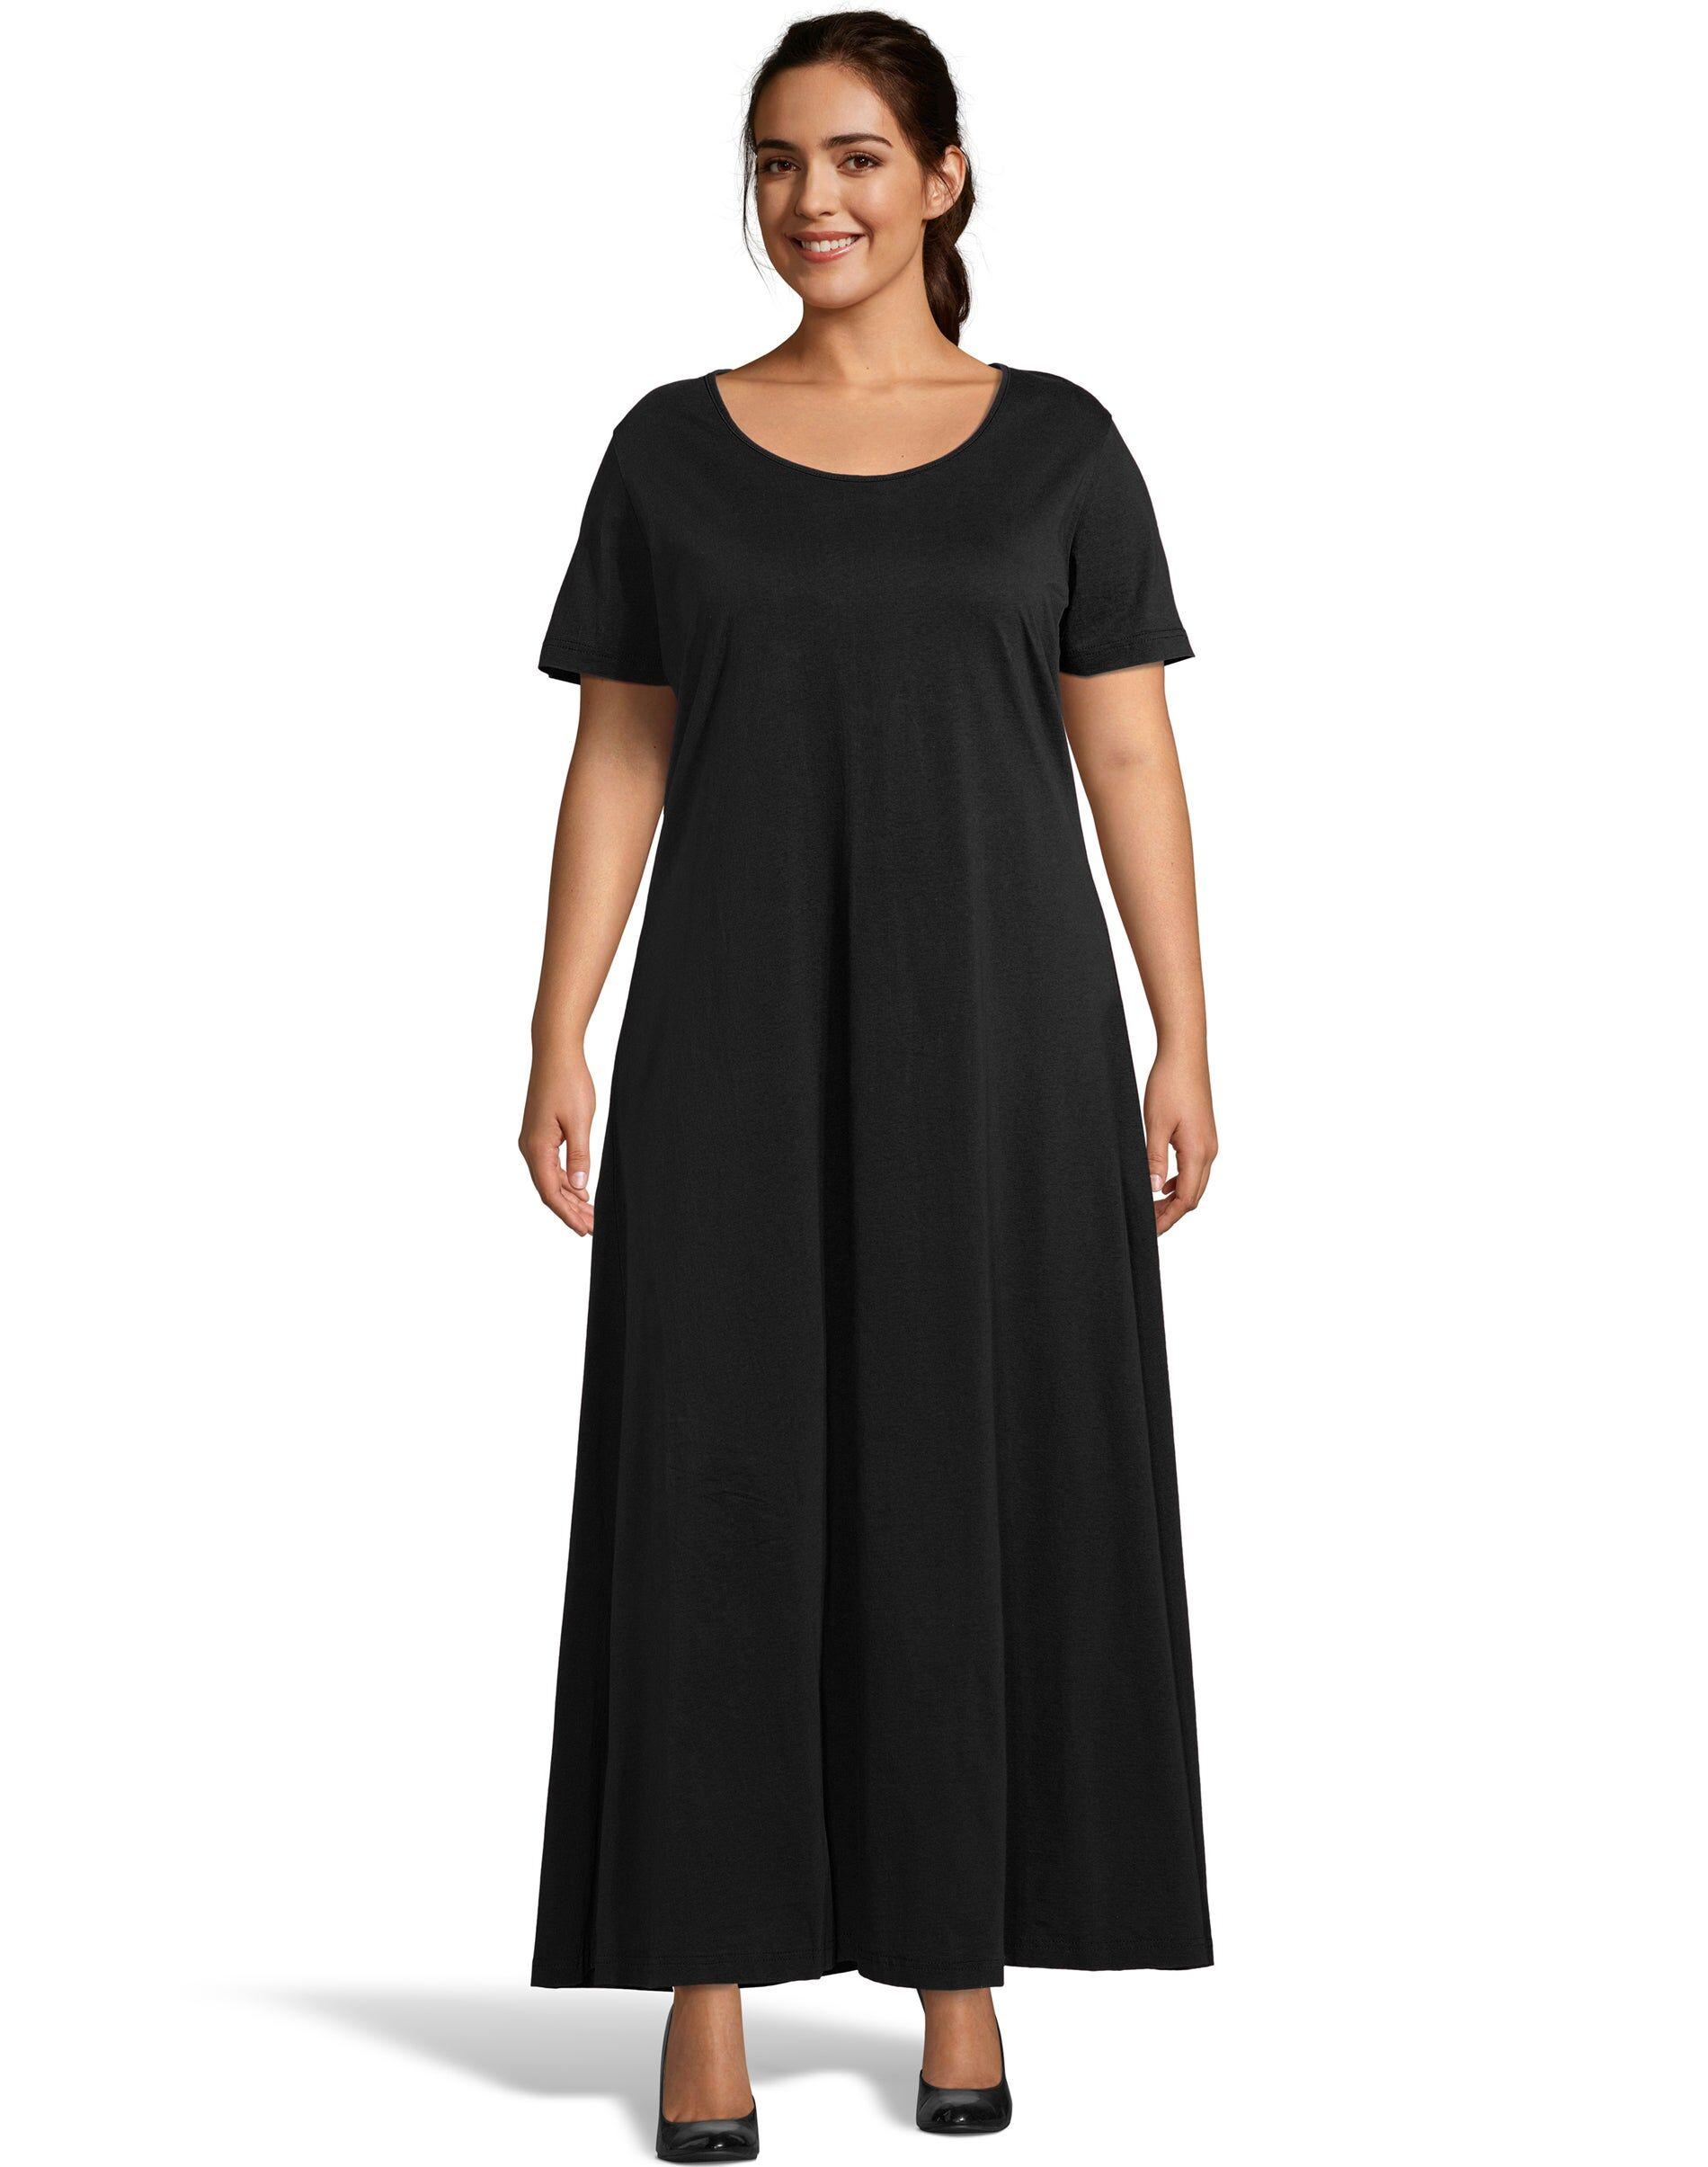 Just My Size Jersey Matchables Maxi Dress Black 3X Women's